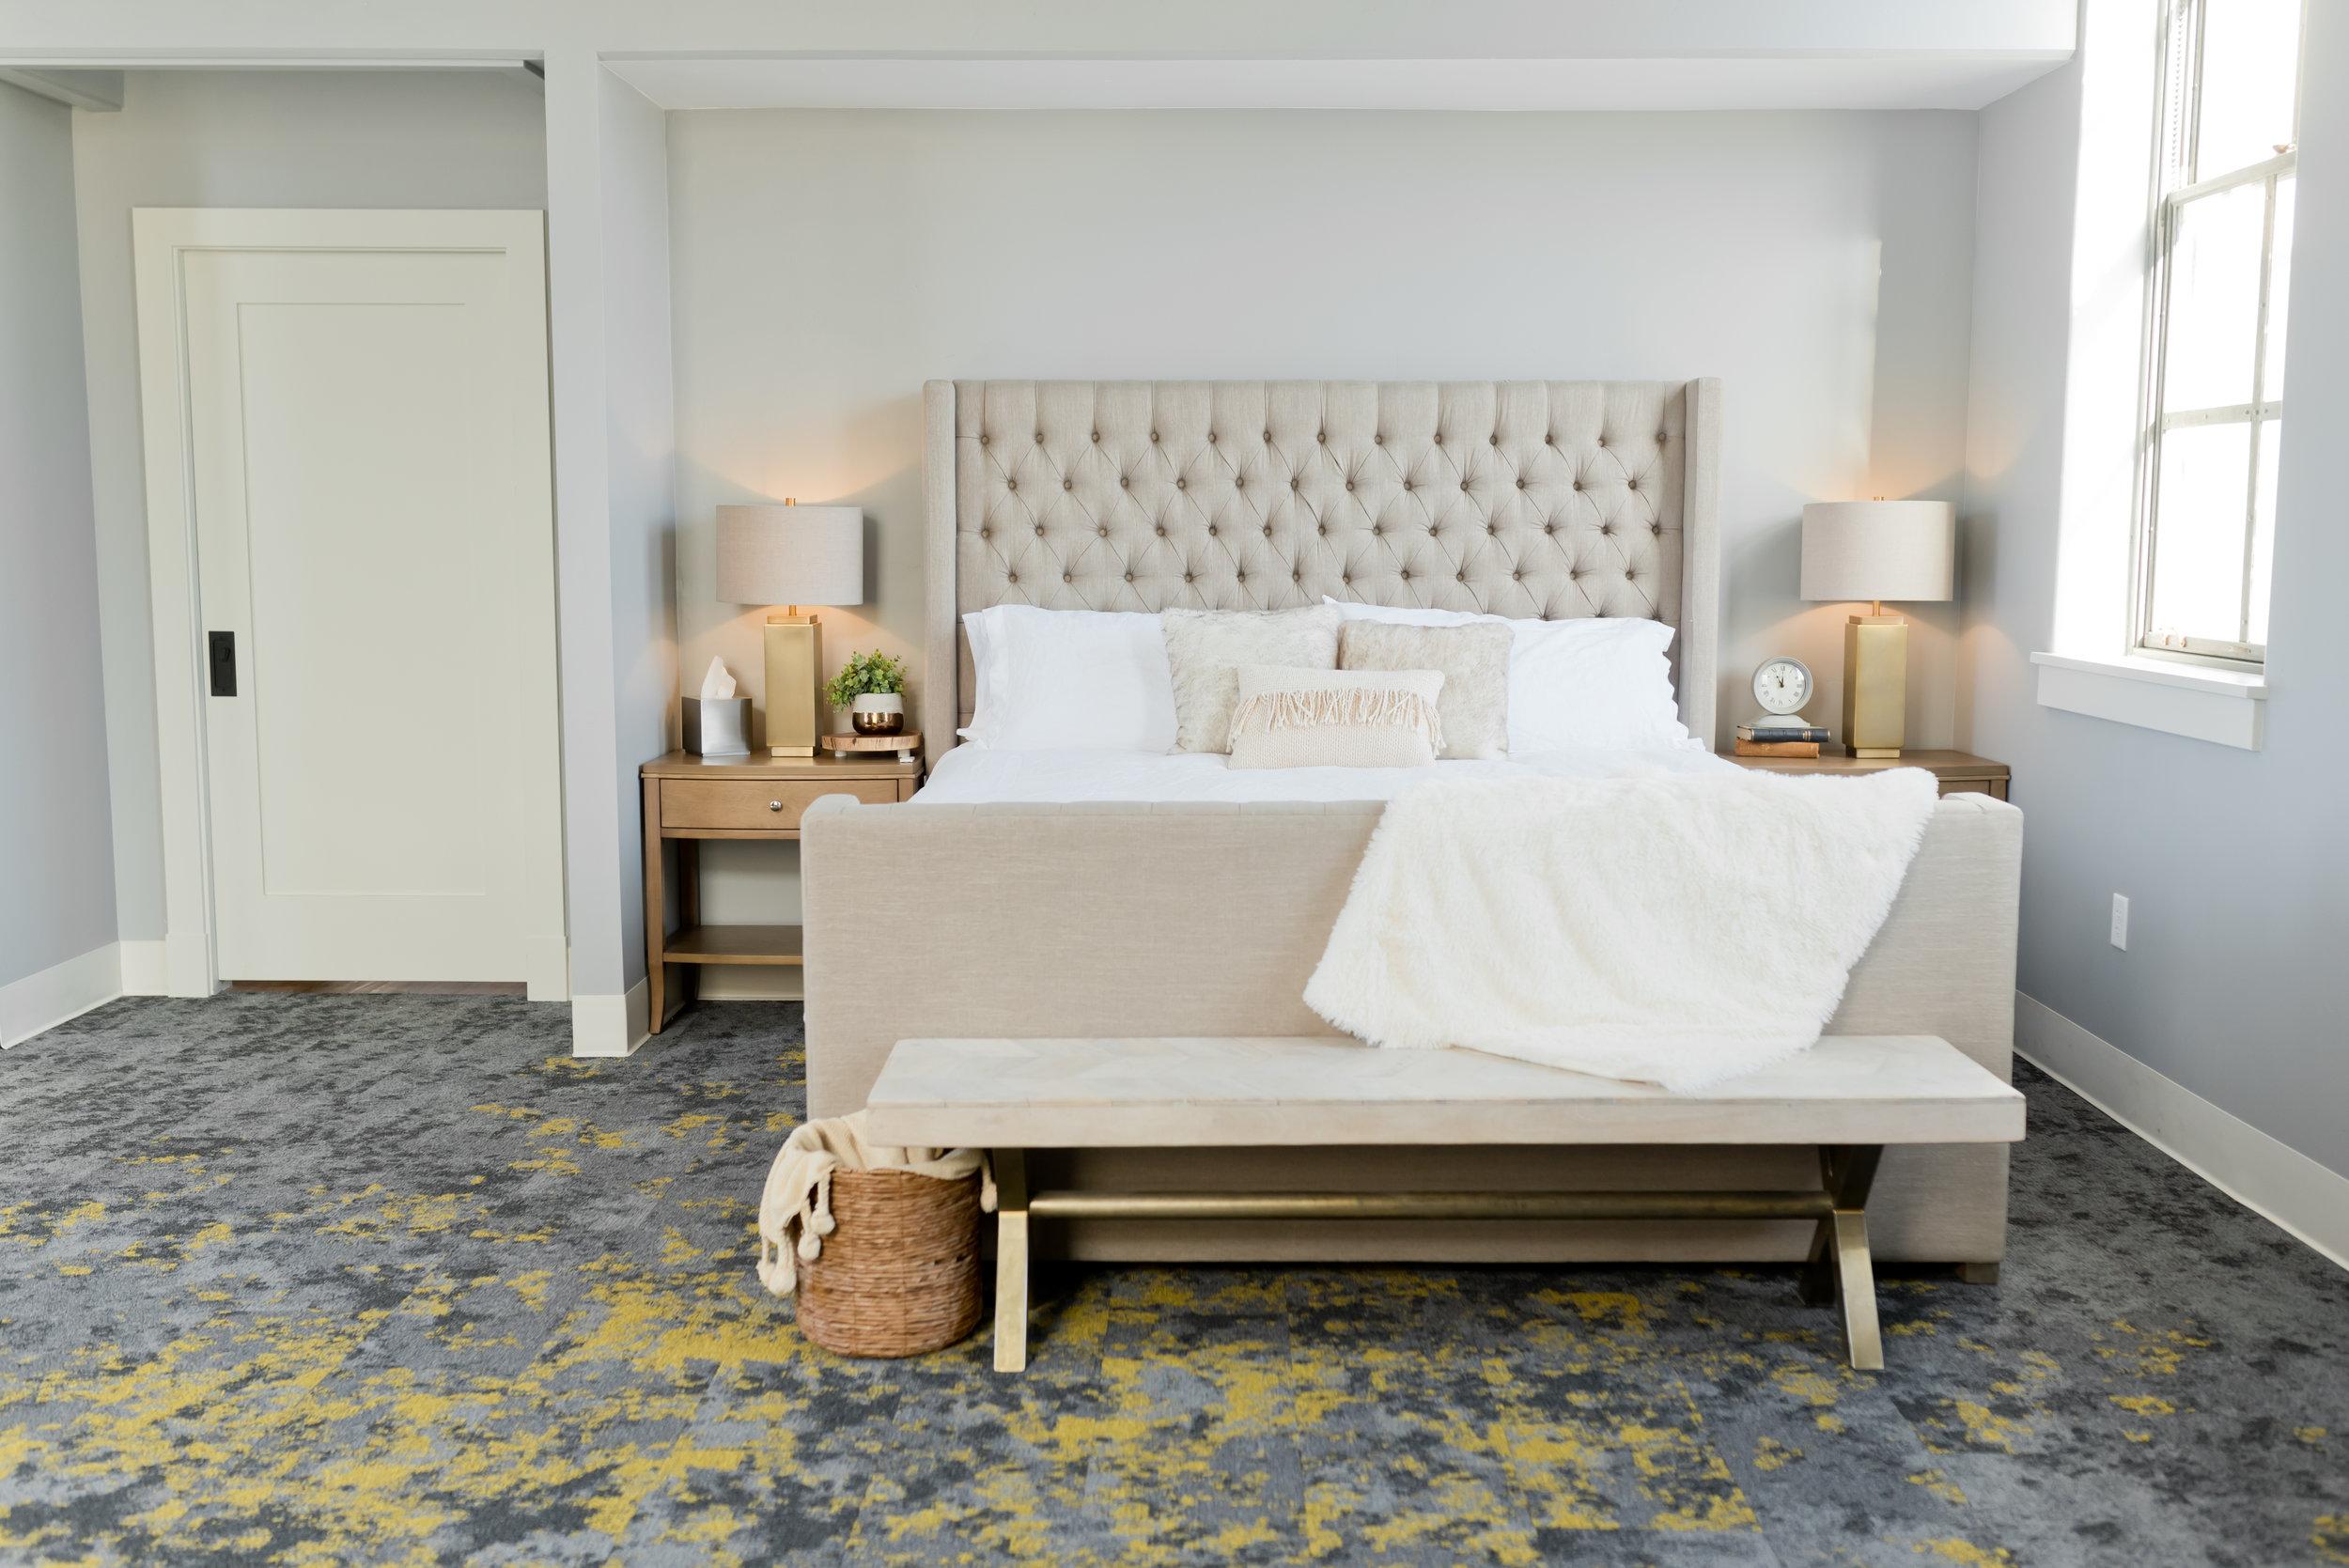 SouthFlatLuxurySuite_Bedroom_22EastCenter.jpg